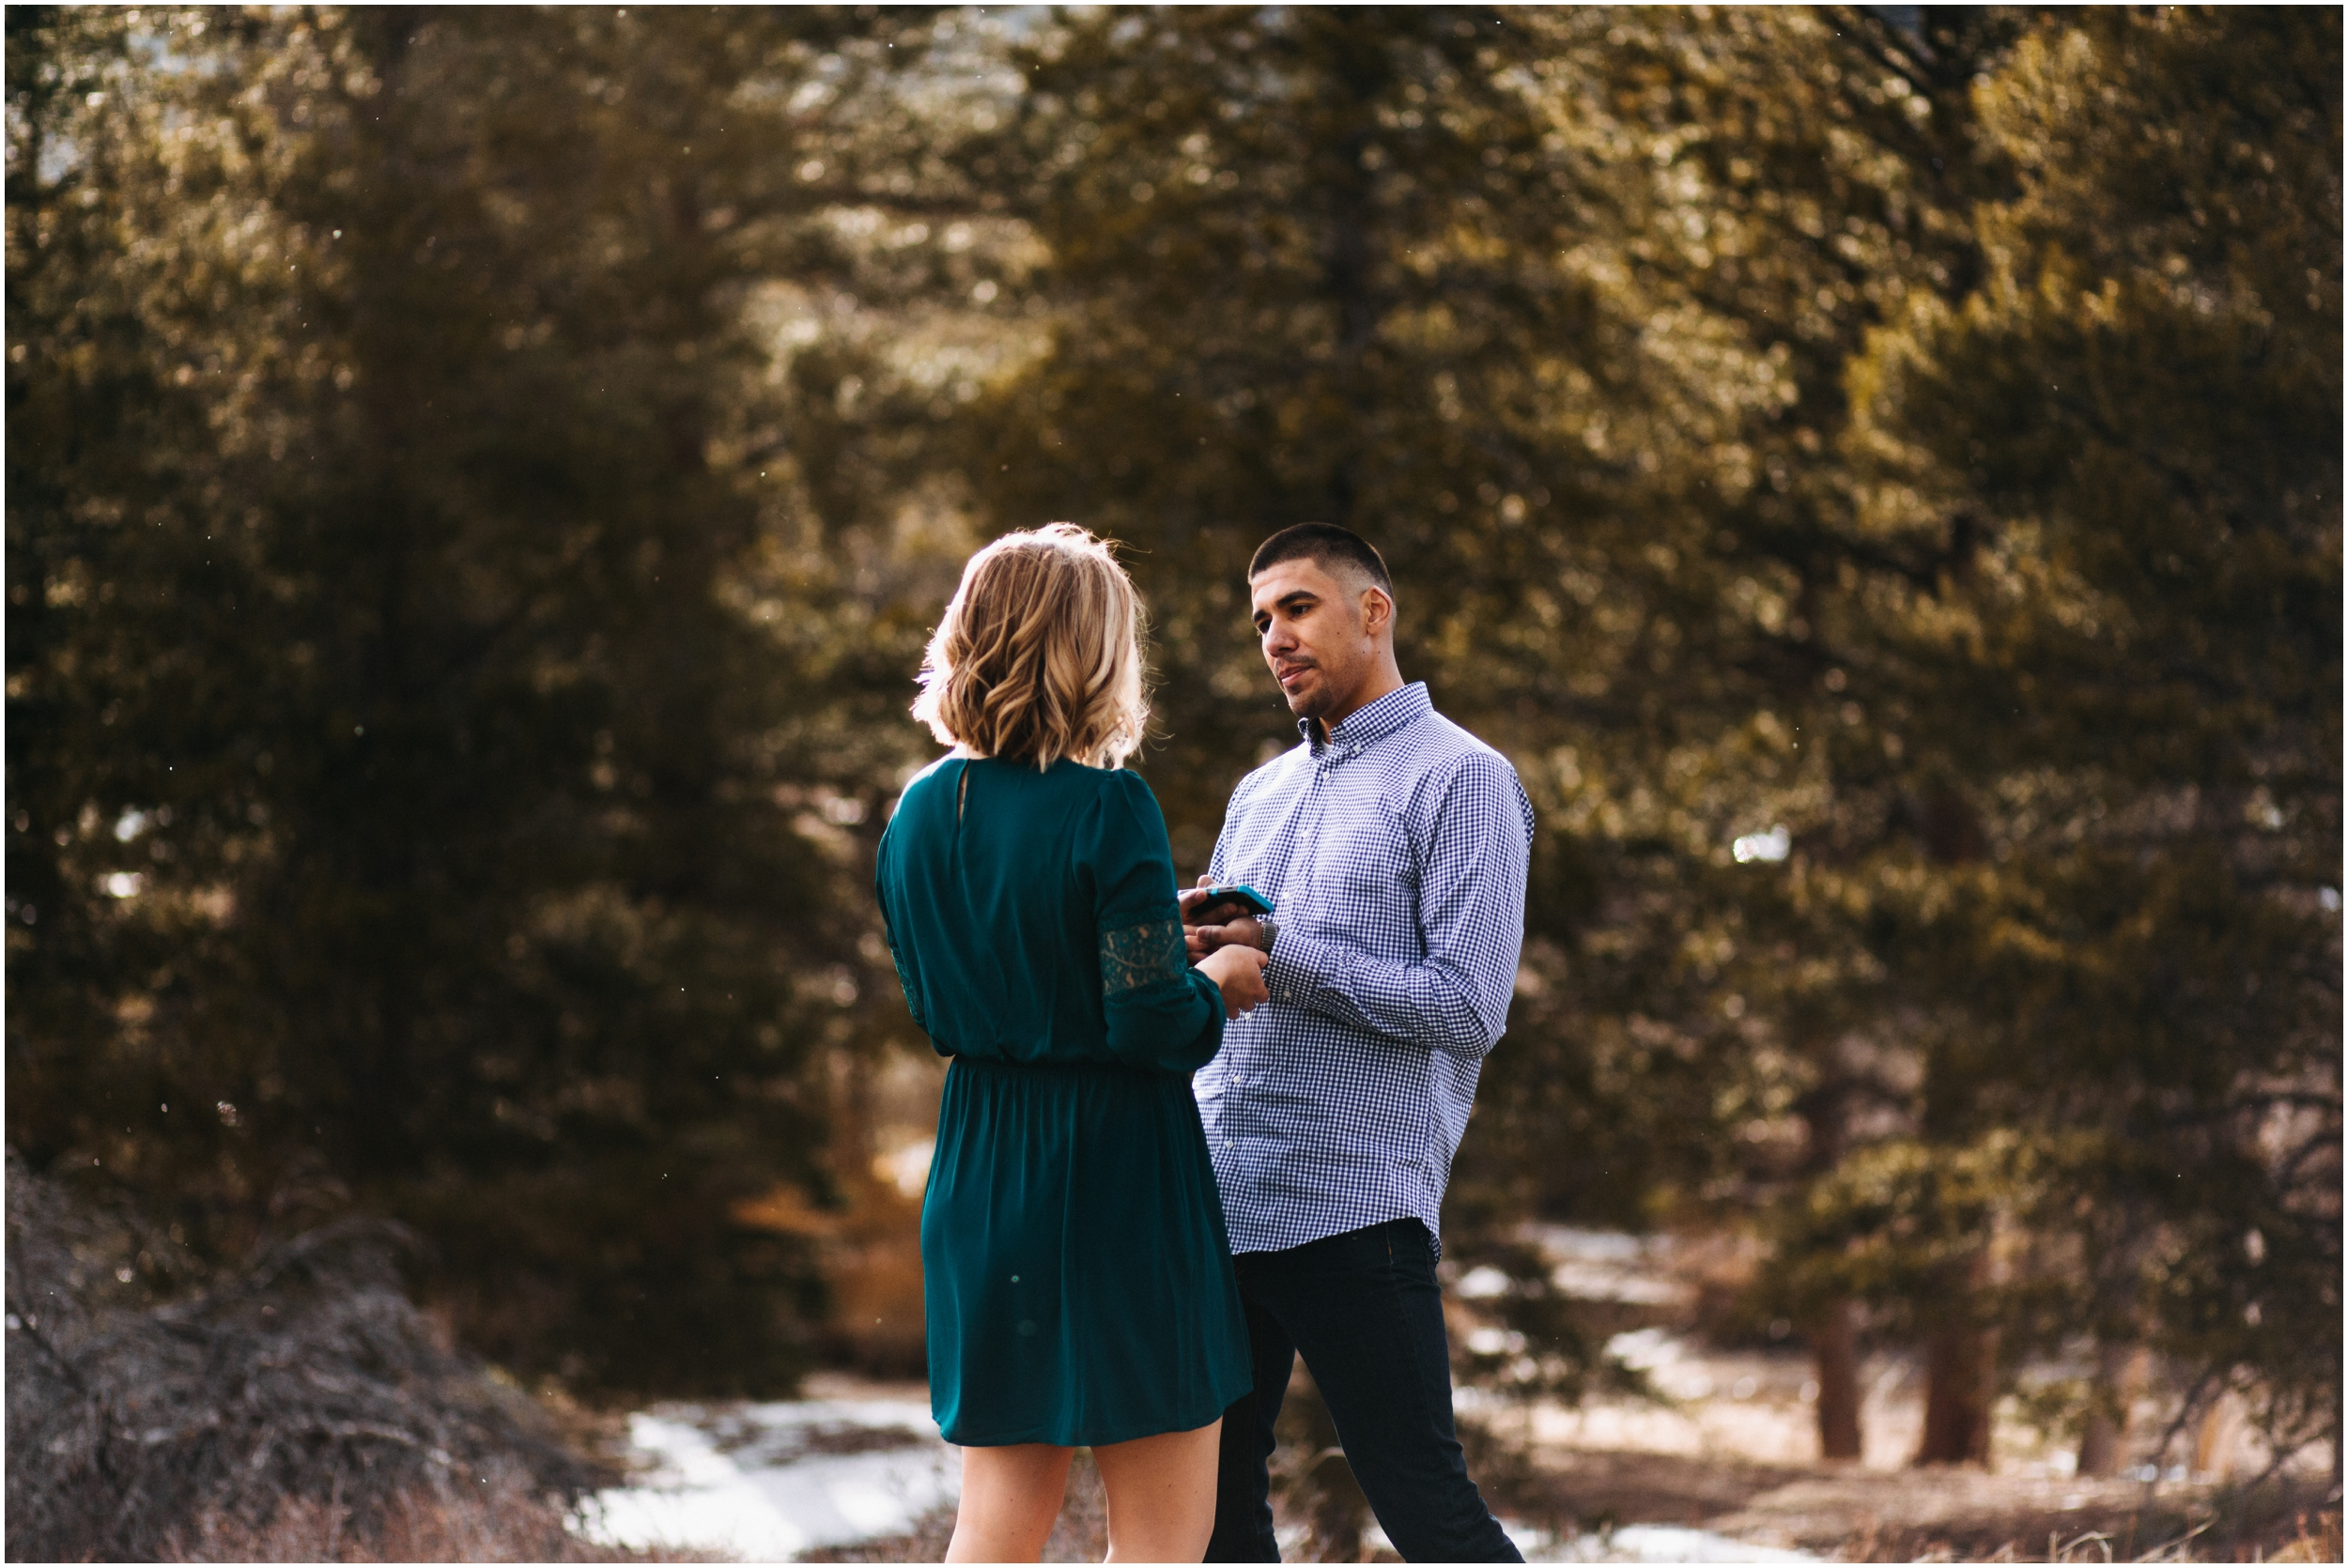 rocky-mountain-national-park-elopement-sprague-lake-colorado-adventure-wedding-photographer_taylor-powers_60.jpg